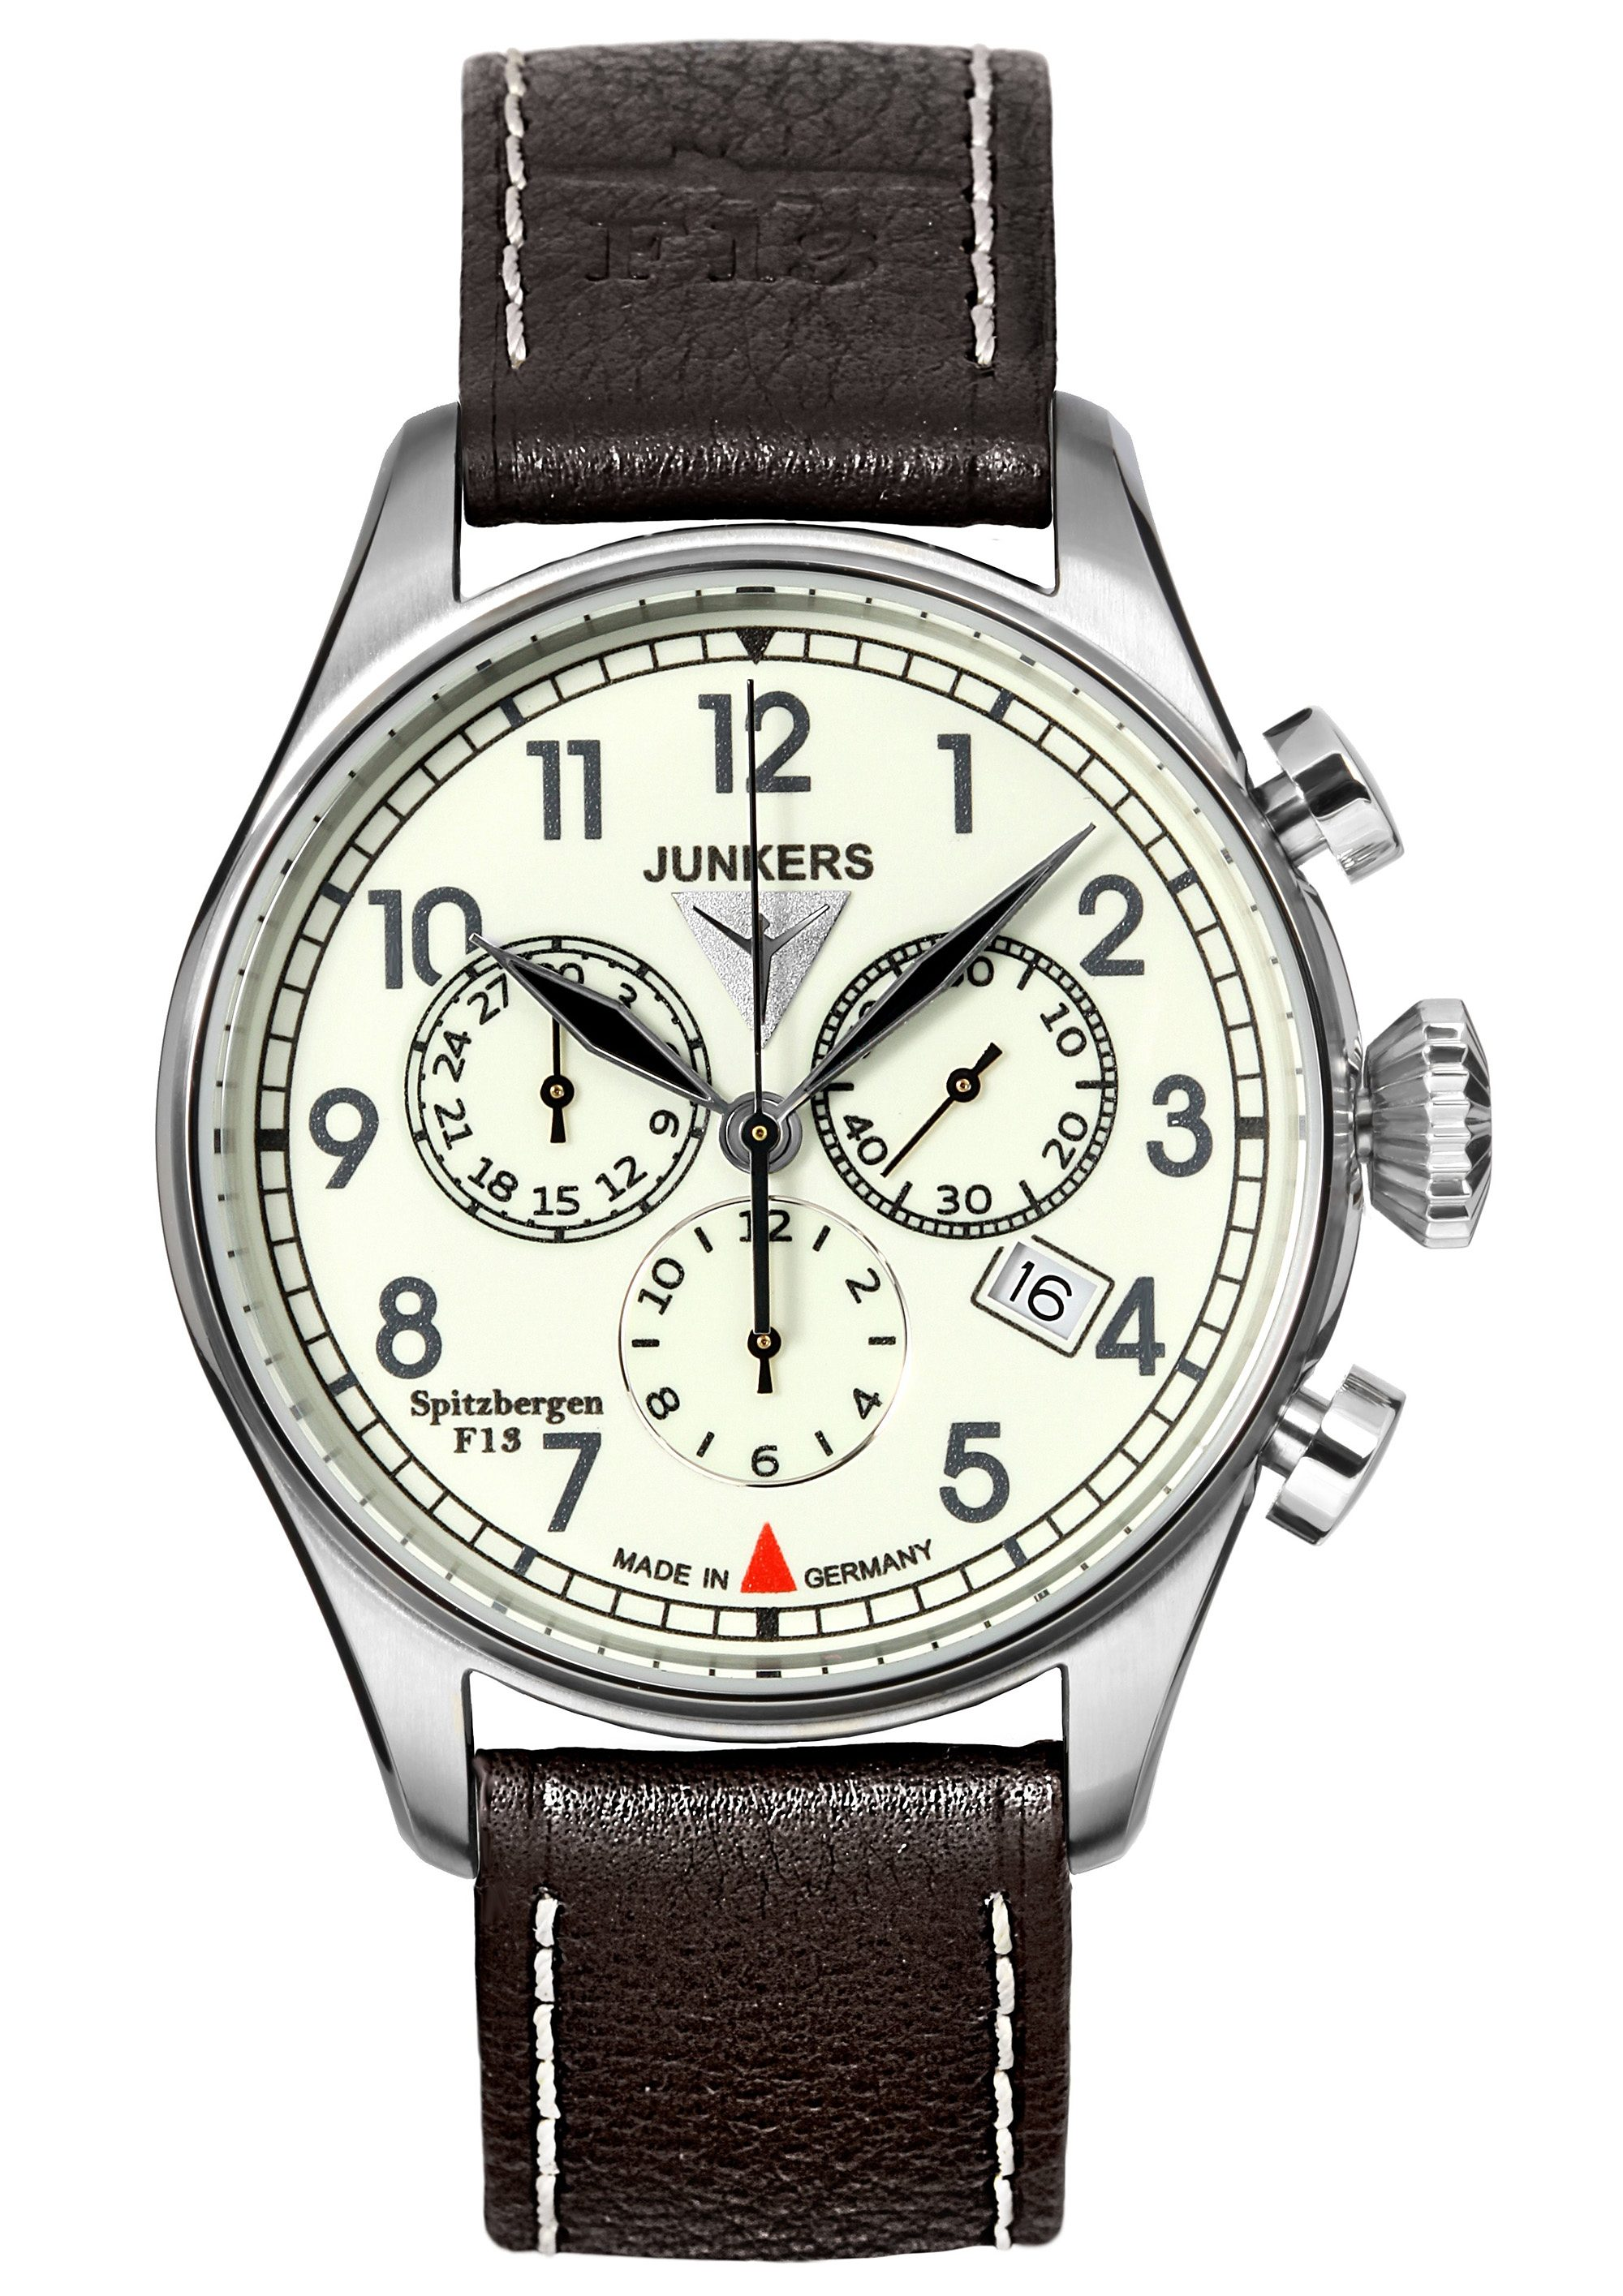 Junkers-Uhren Chronograph »Spitzbergen F13, 6186-5« Made in Germany